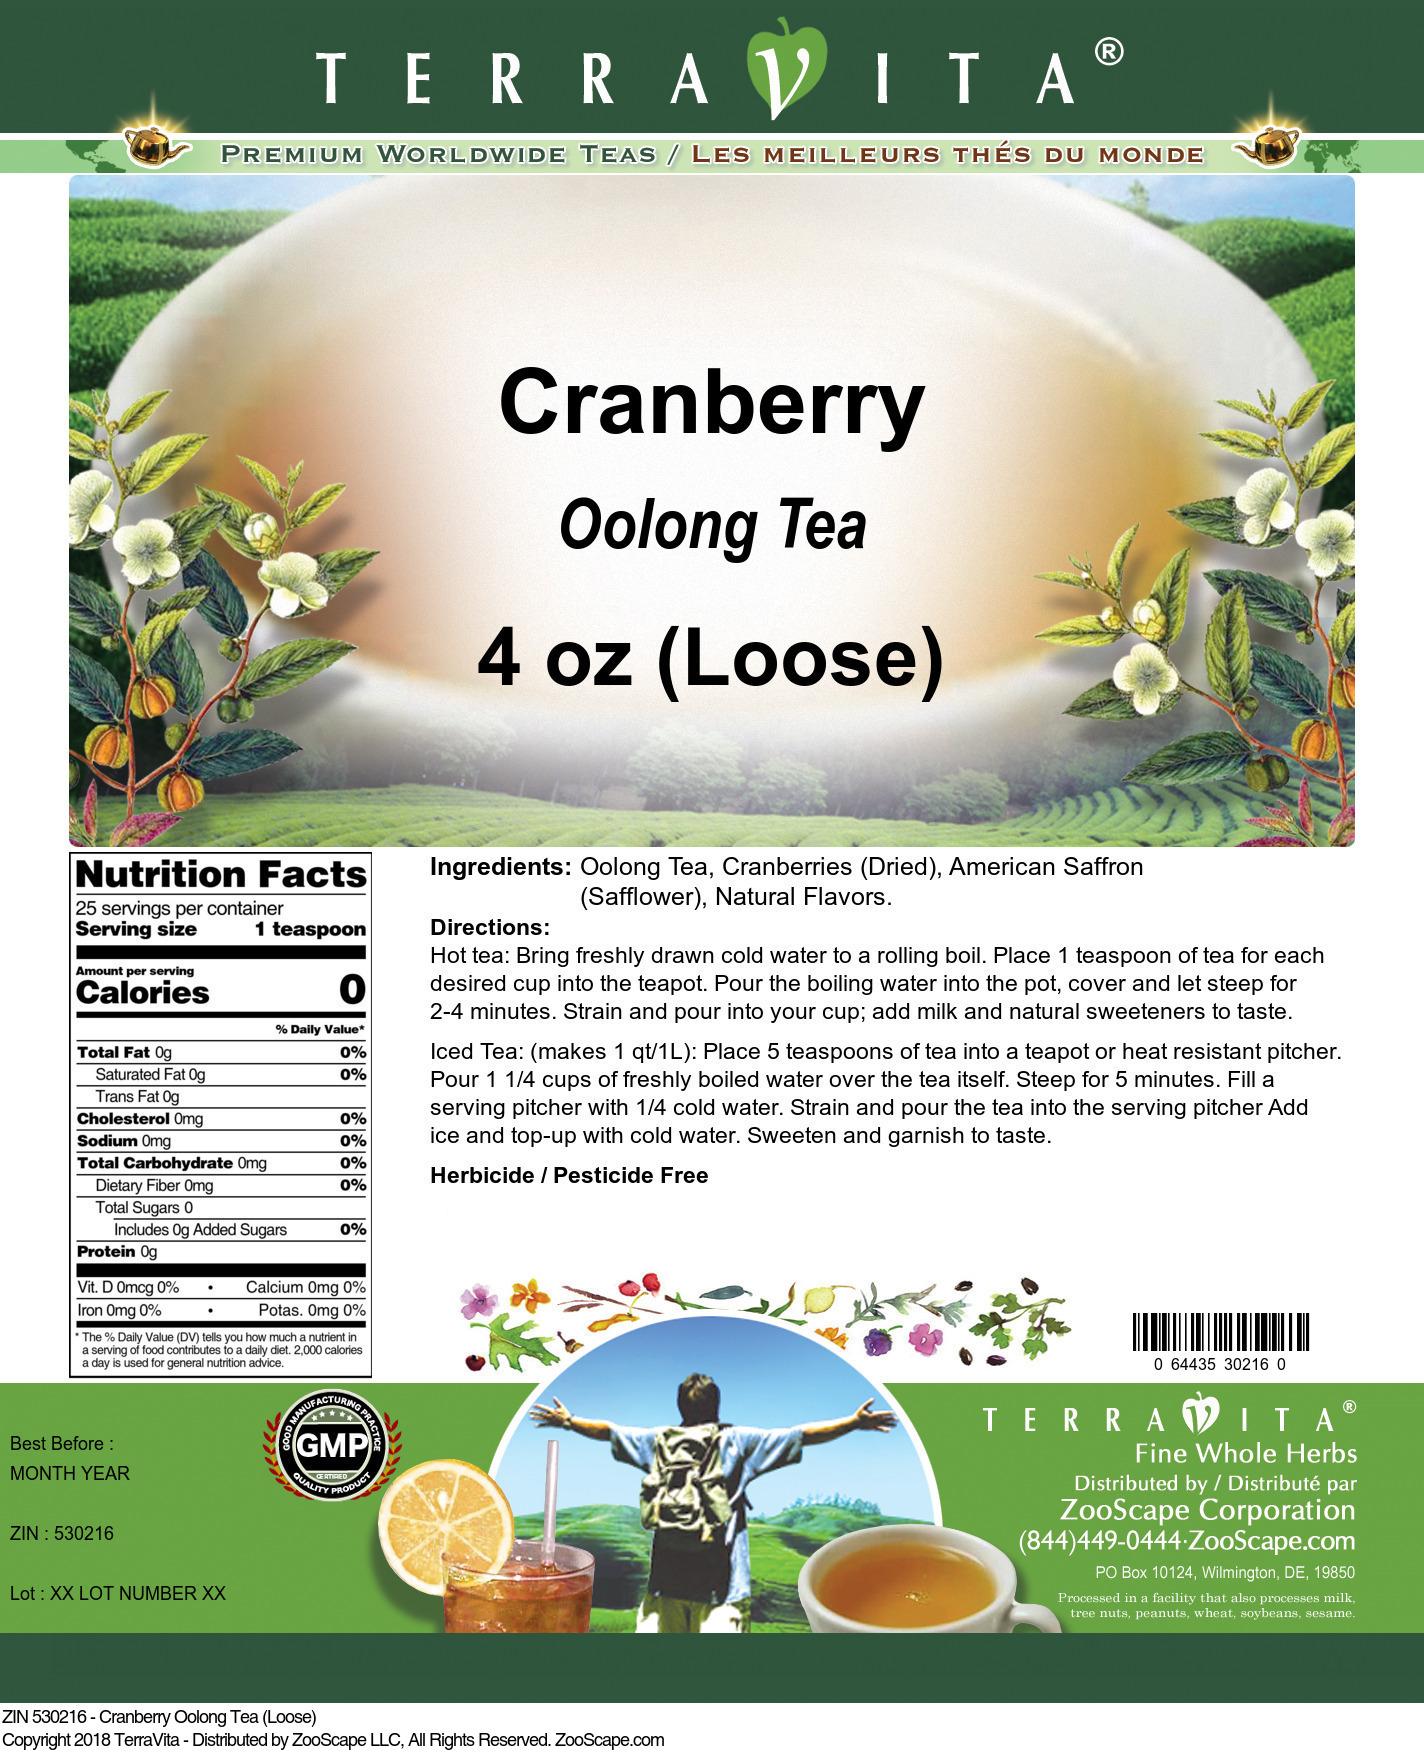 Cranberry Oolong Tea (Loose)